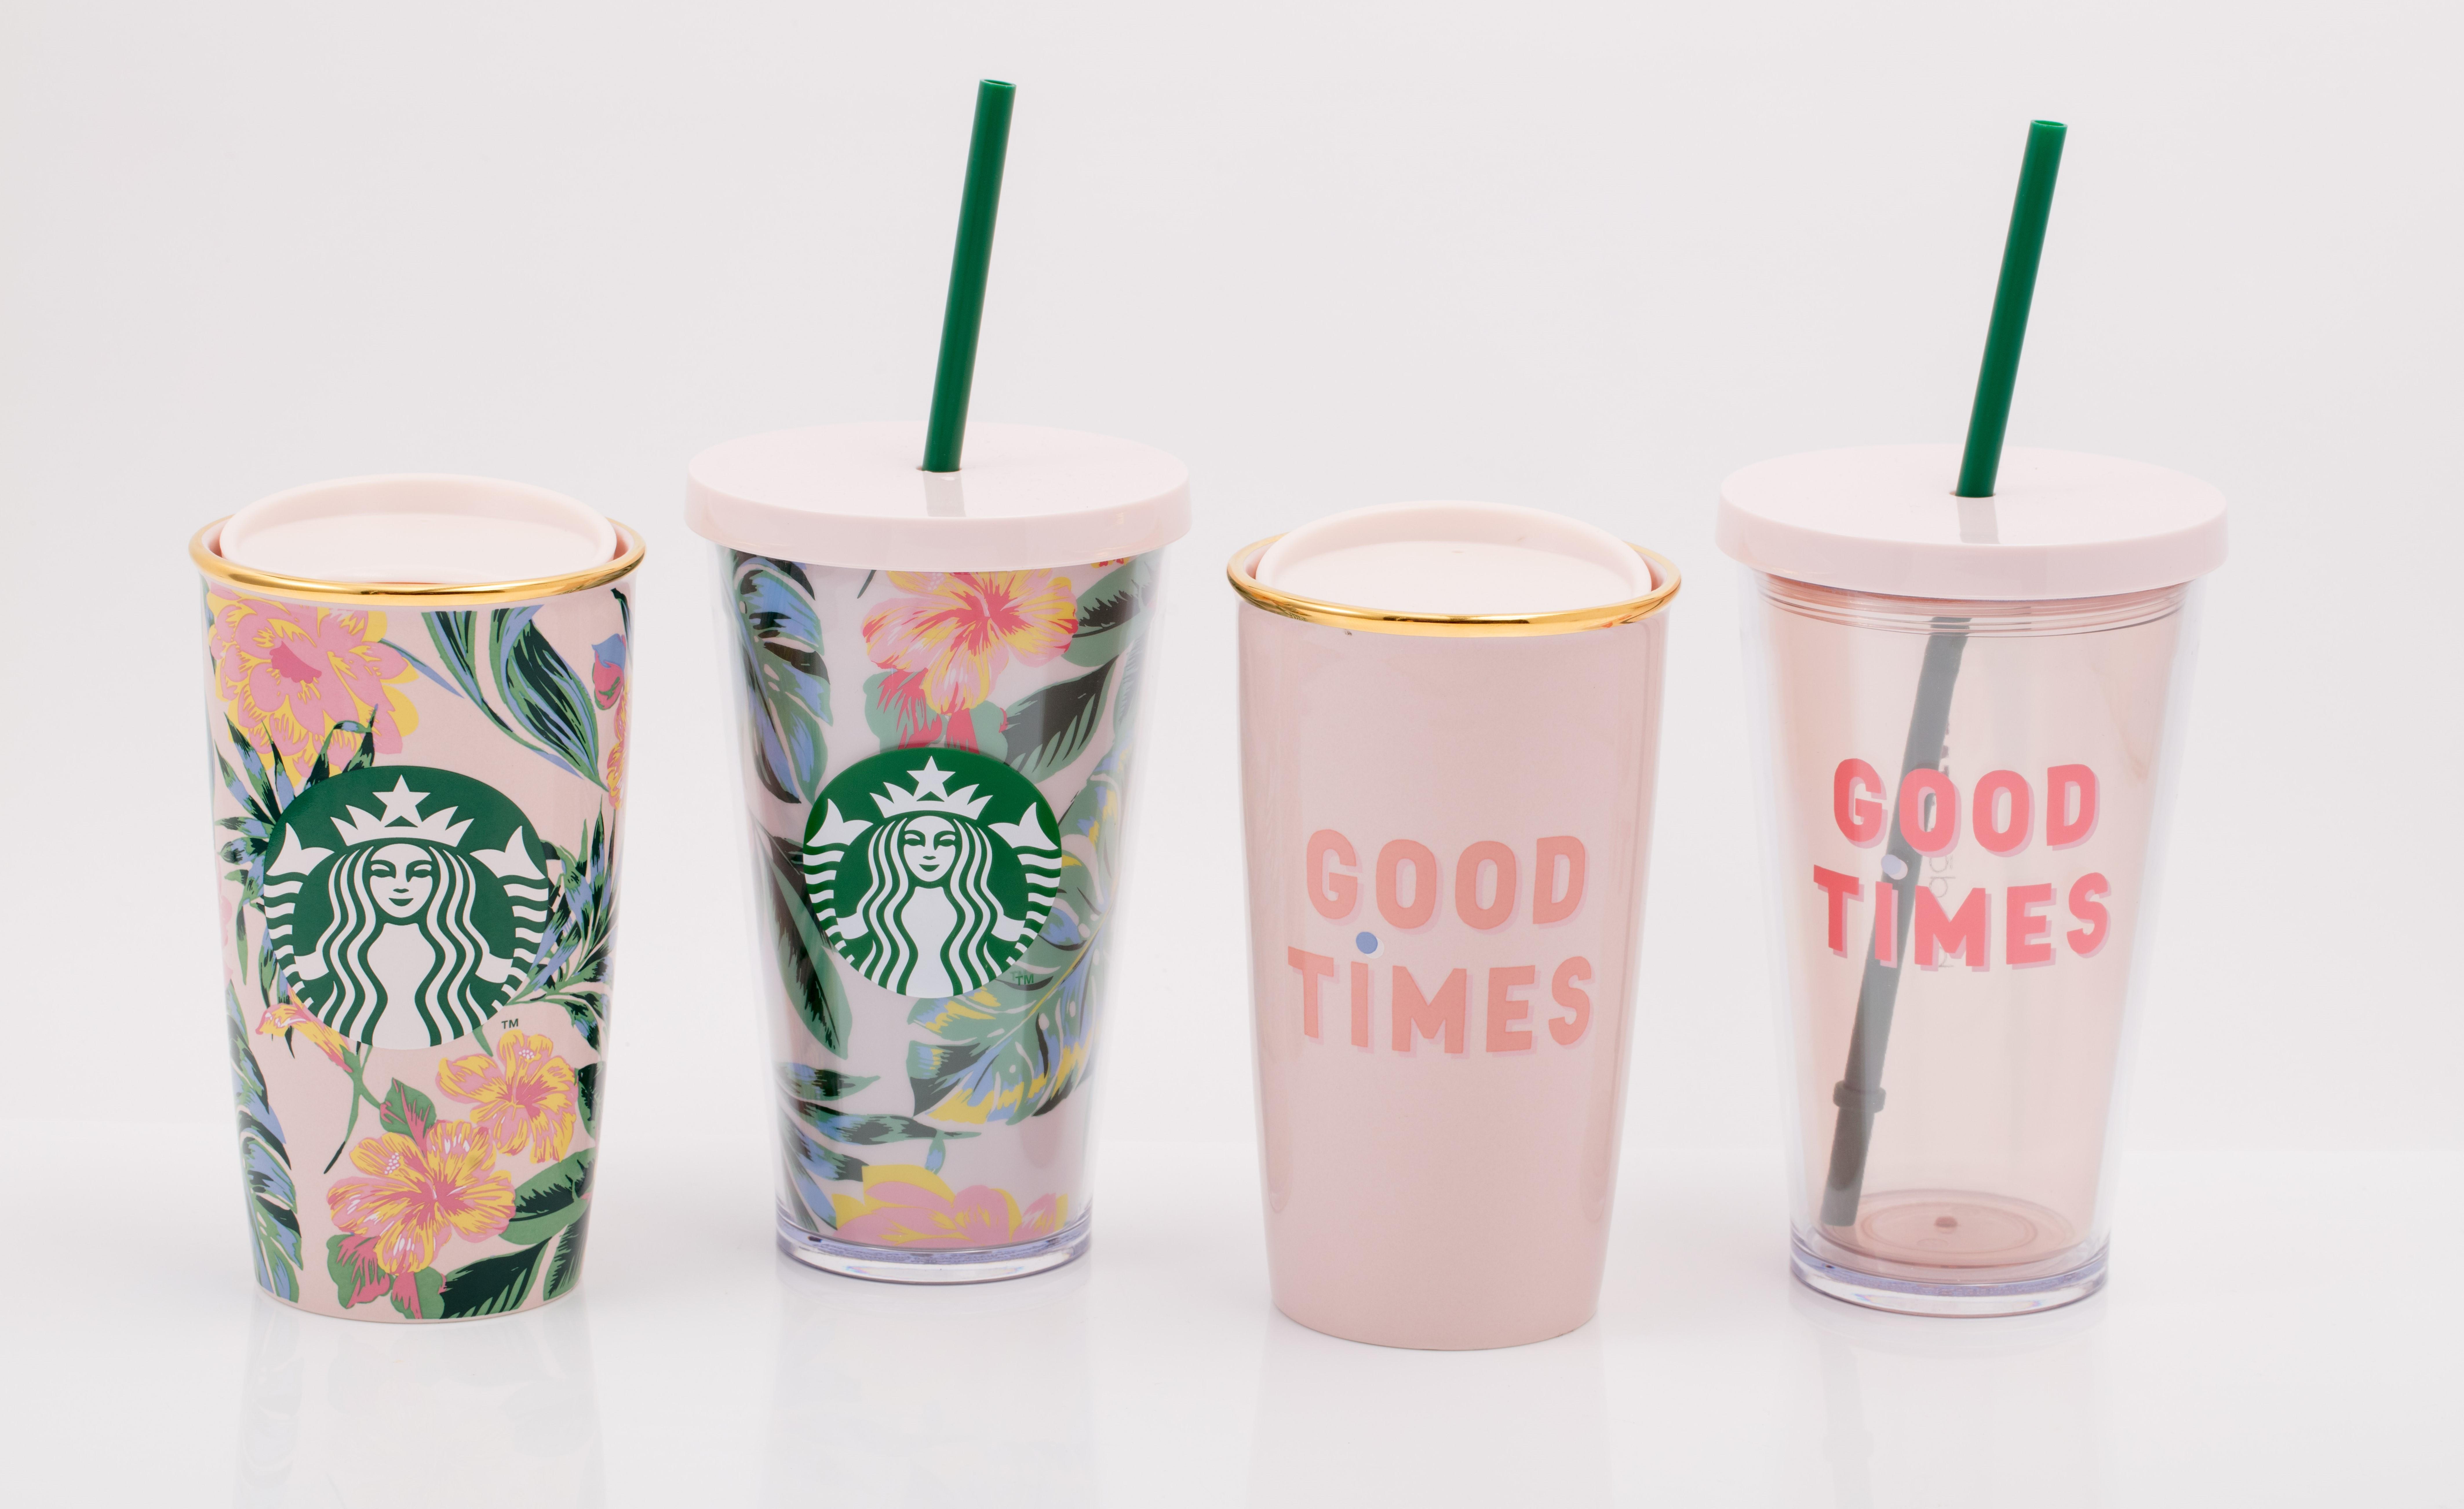 Starbucks' cups.